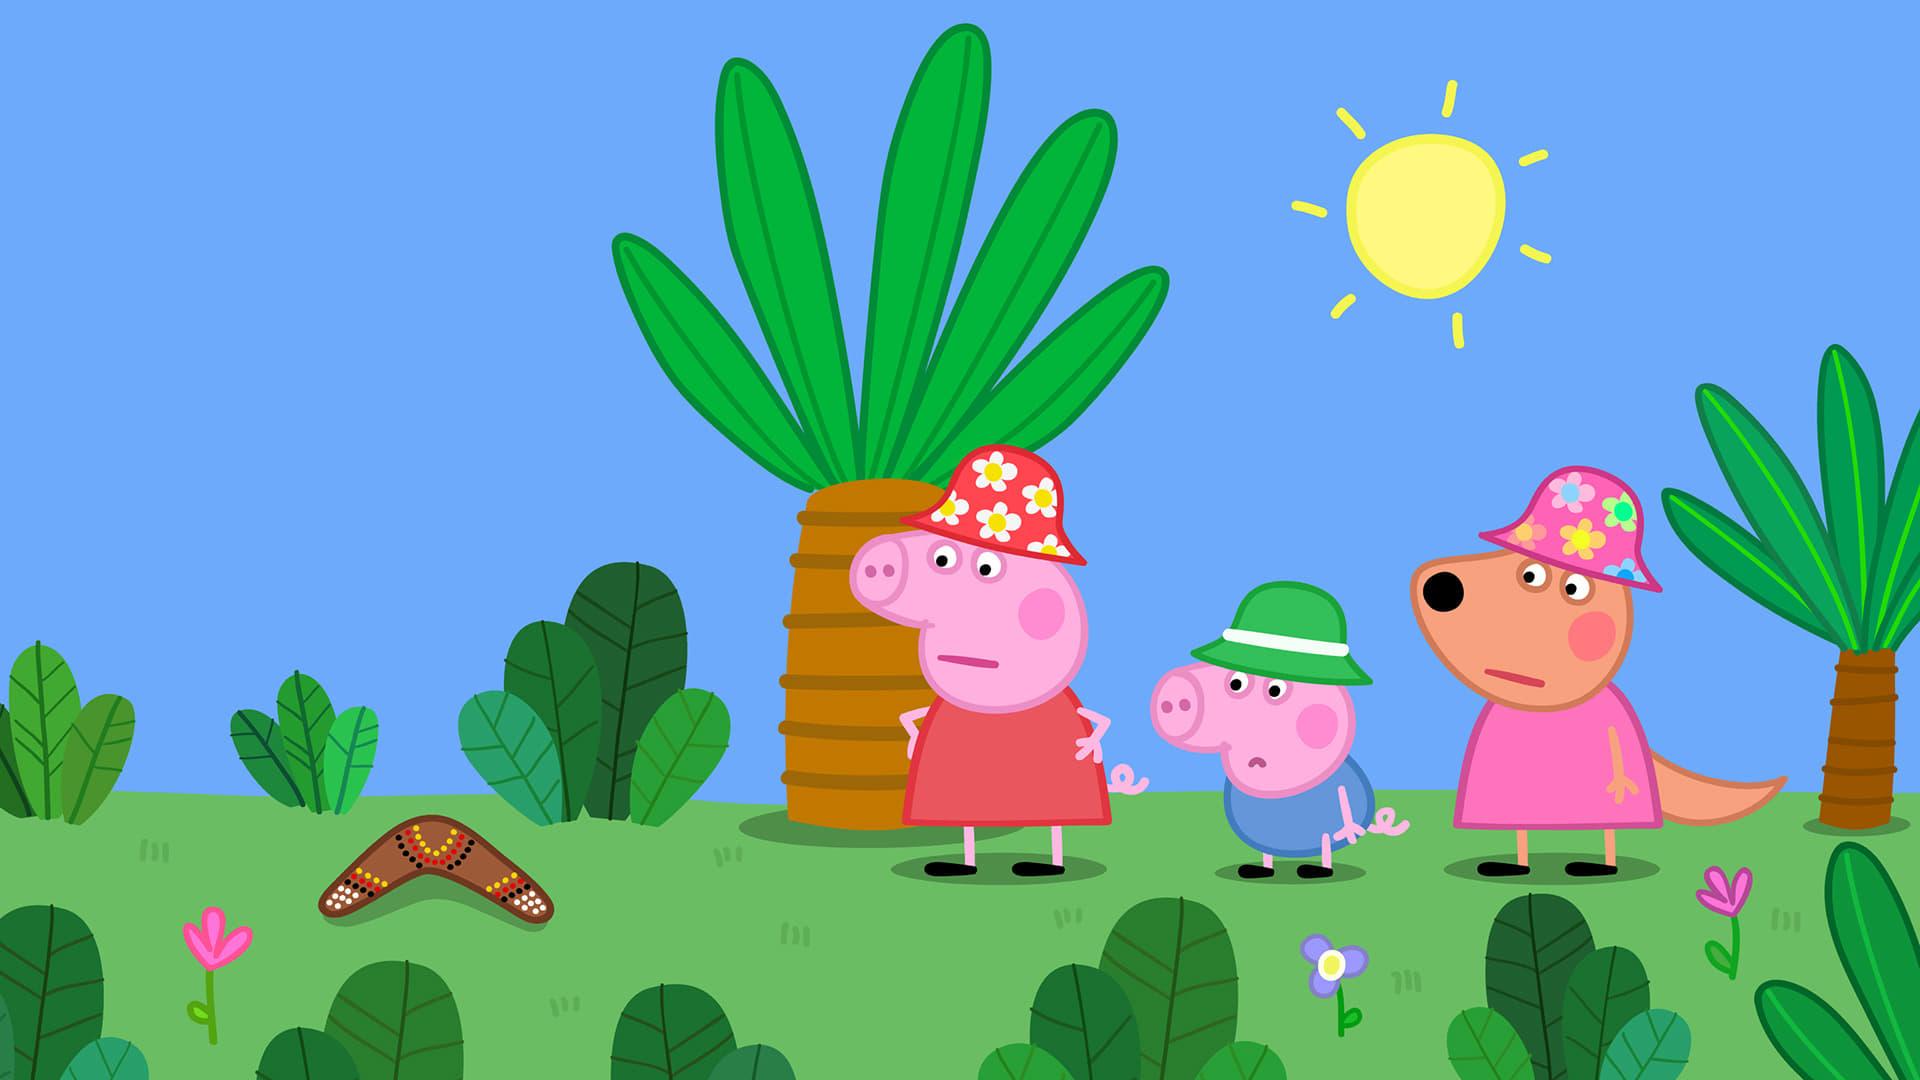 Peppa Pig Season 5 :Episode 22  Australia Part 4 - The Boomerang